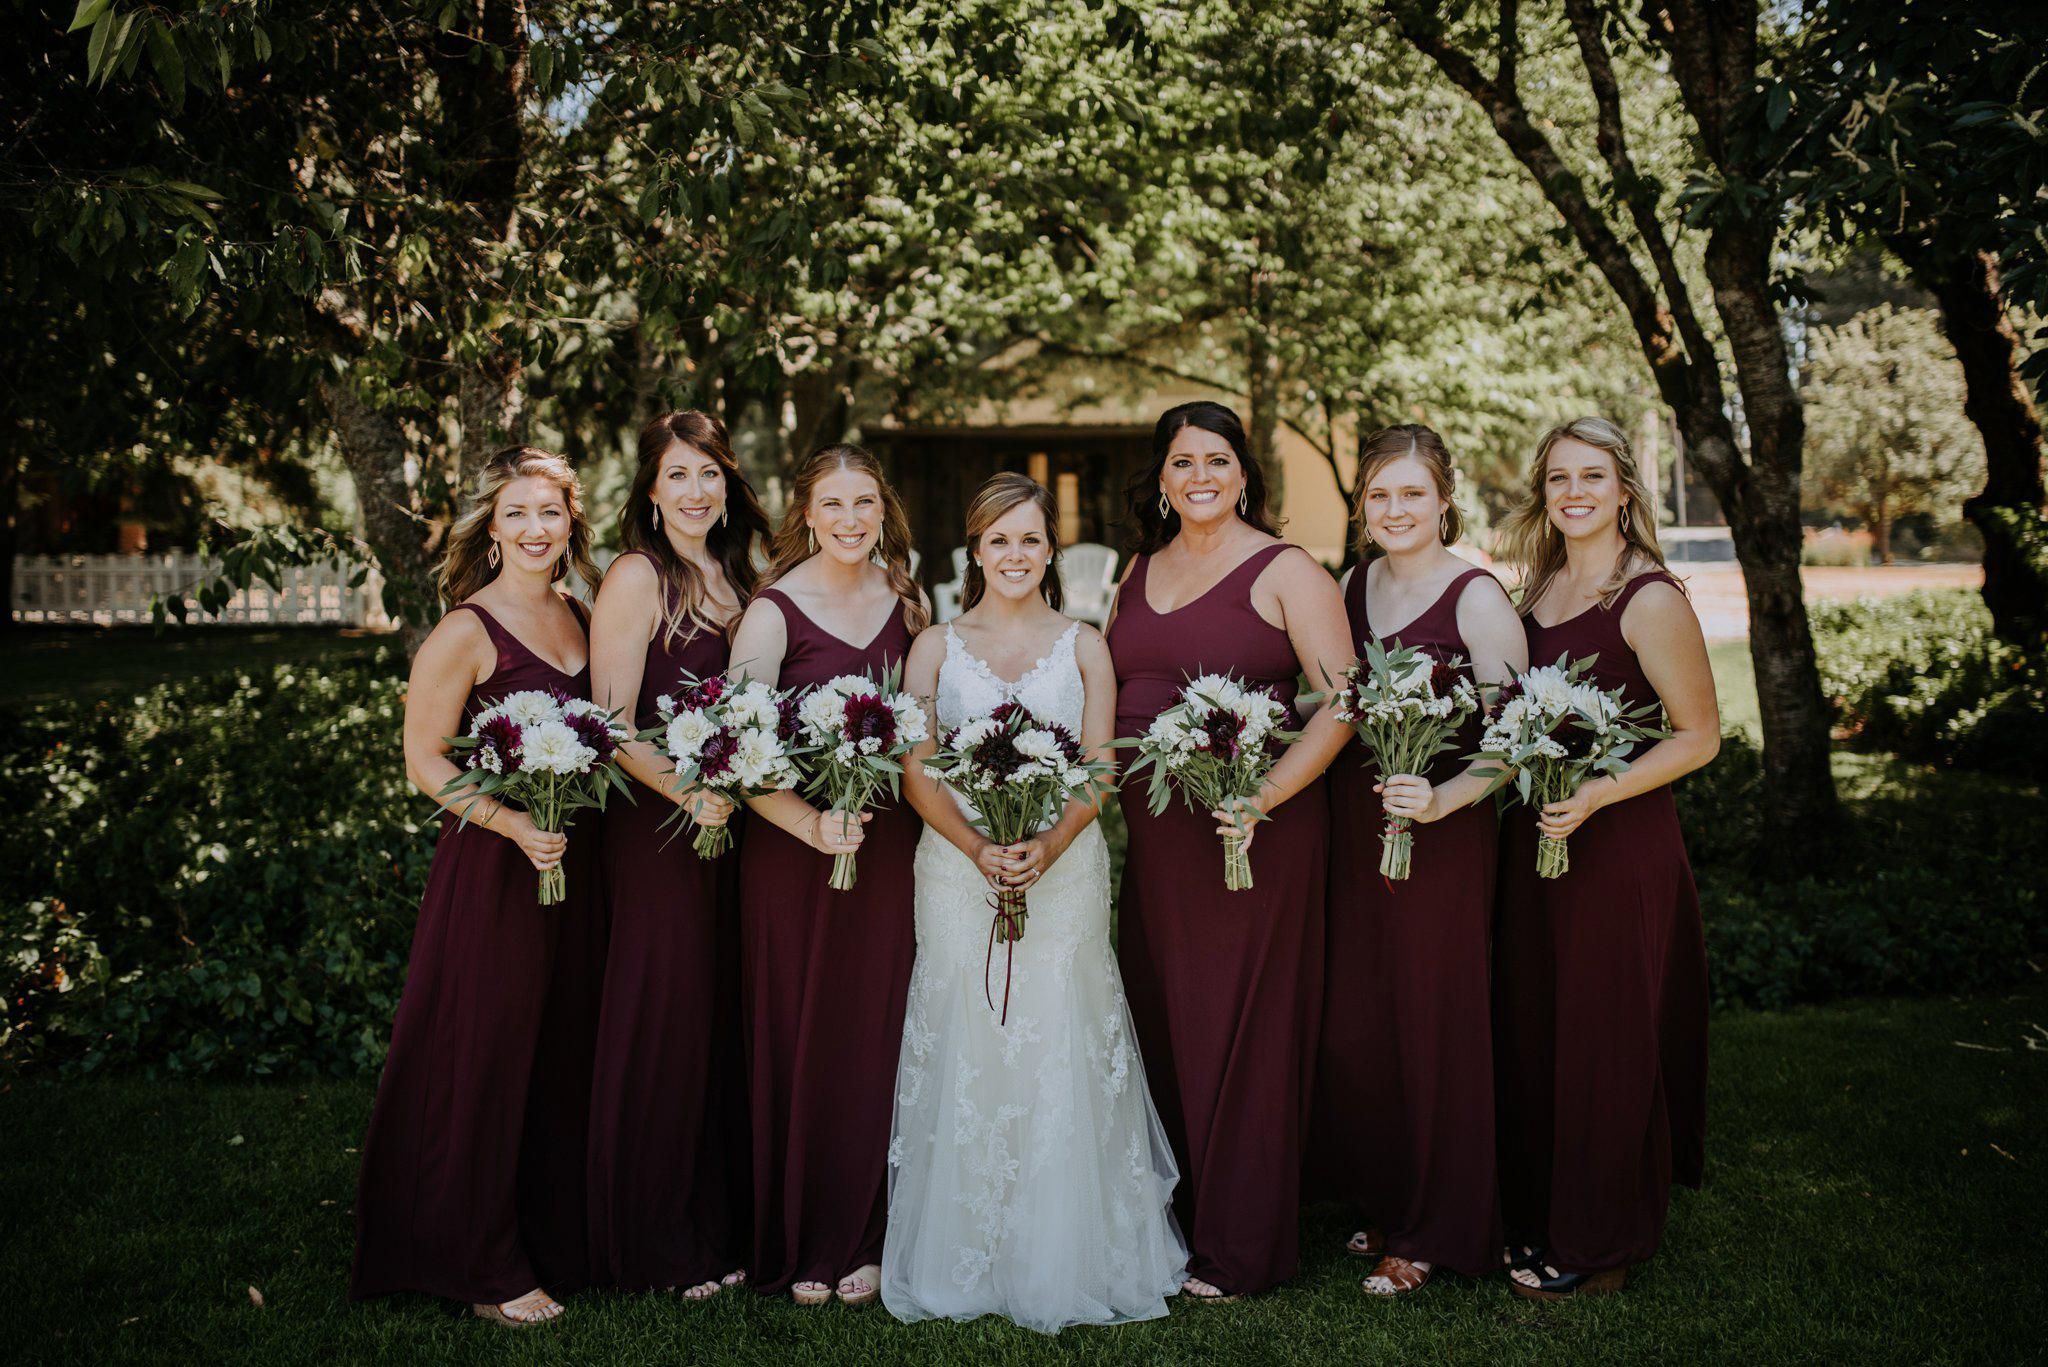 kristen-and-cody-the-kelley-farm-wedding-seattle-photographer-caitlyn-nikula-36.jpg